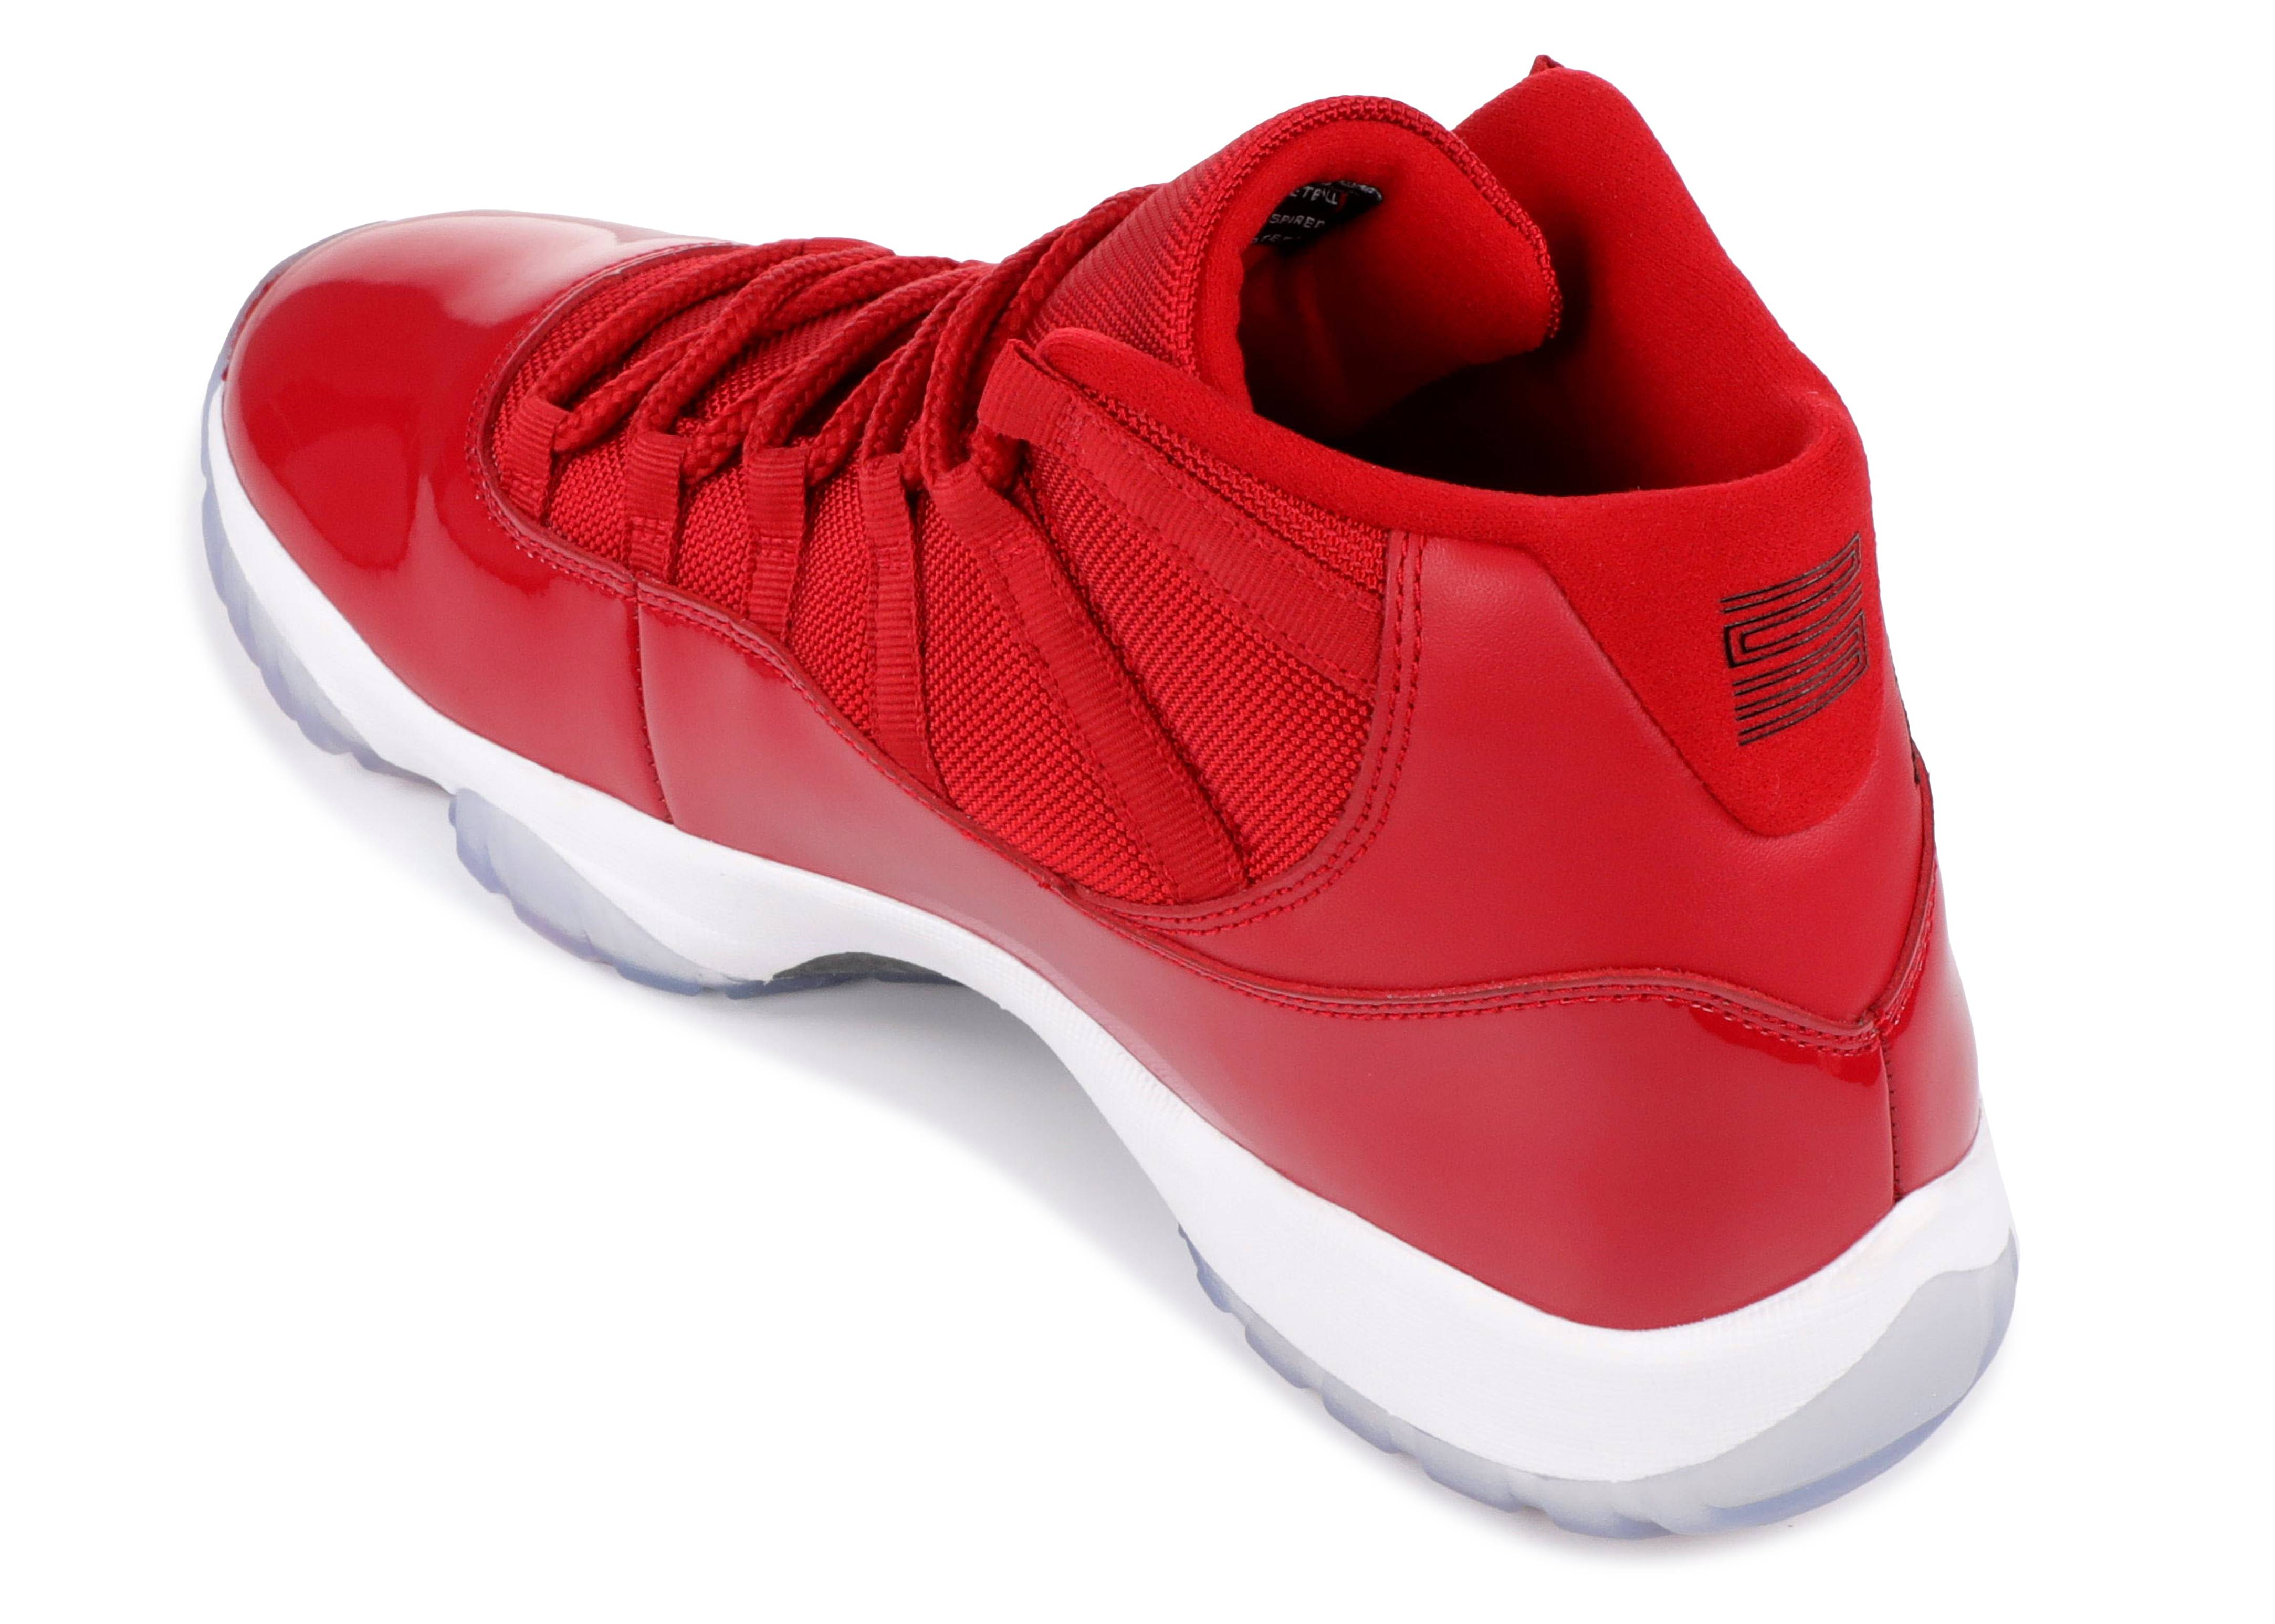 fc0e9df551a0 Air Jordan 11 Retro